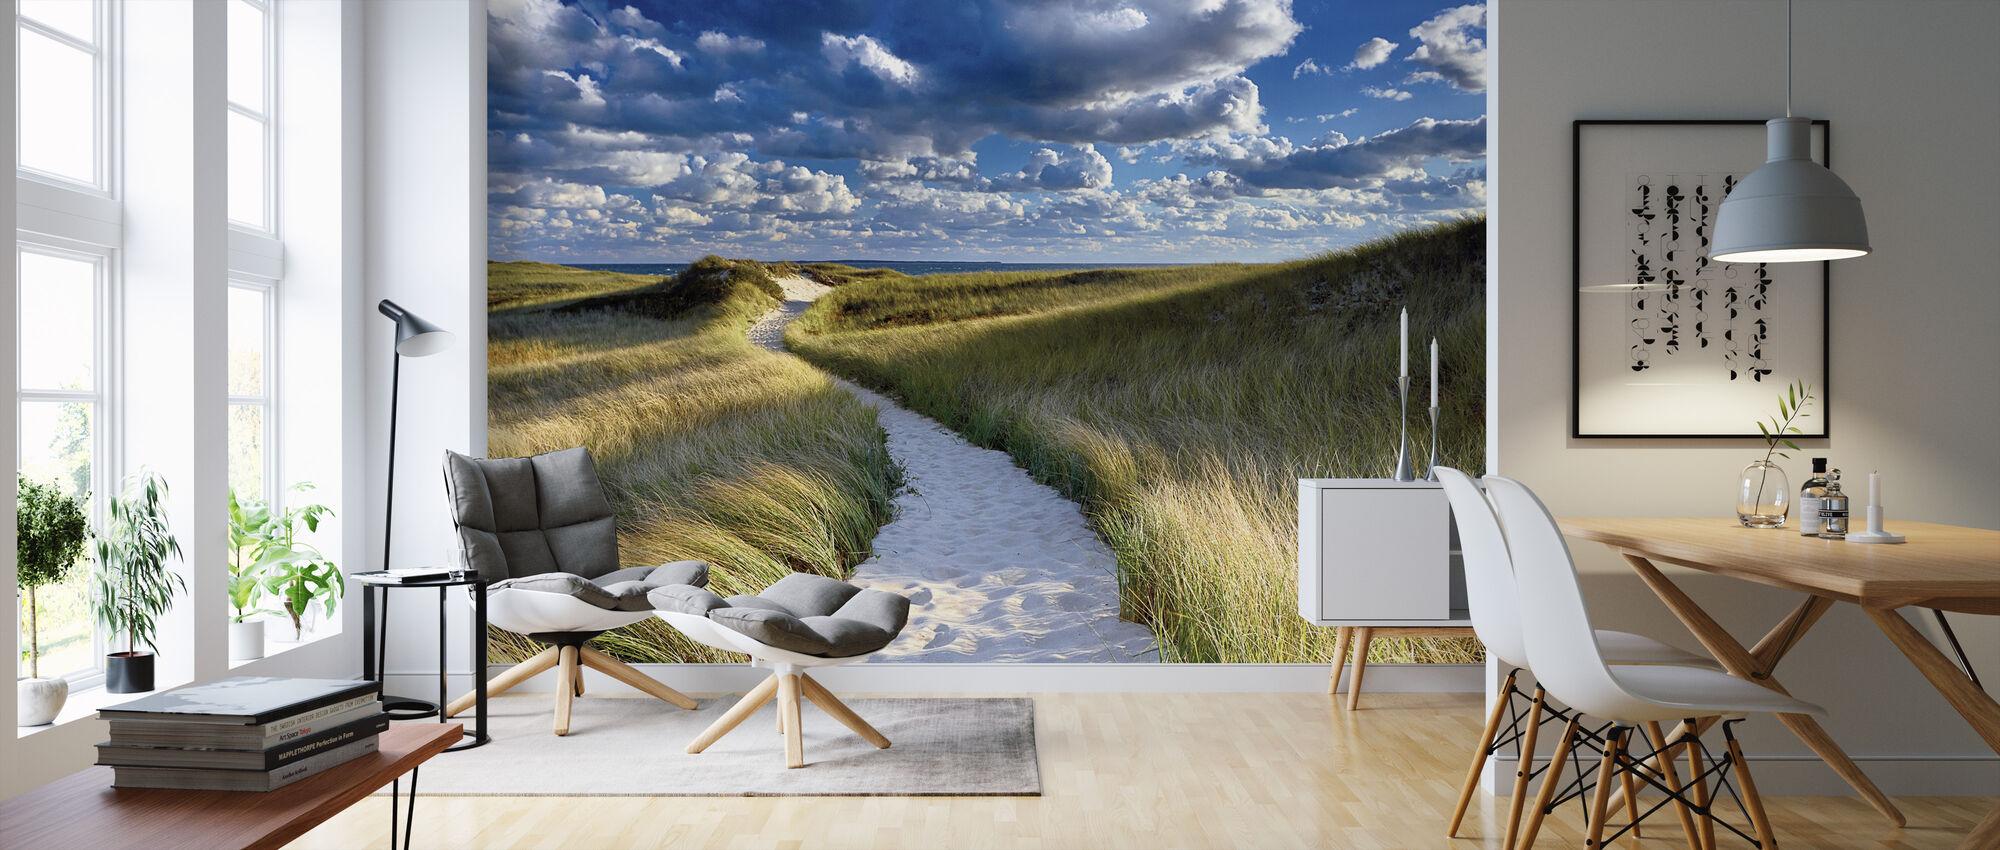 philbin beach fototapete nach ma photowall. Black Bedroom Furniture Sets. Home Design Ideas